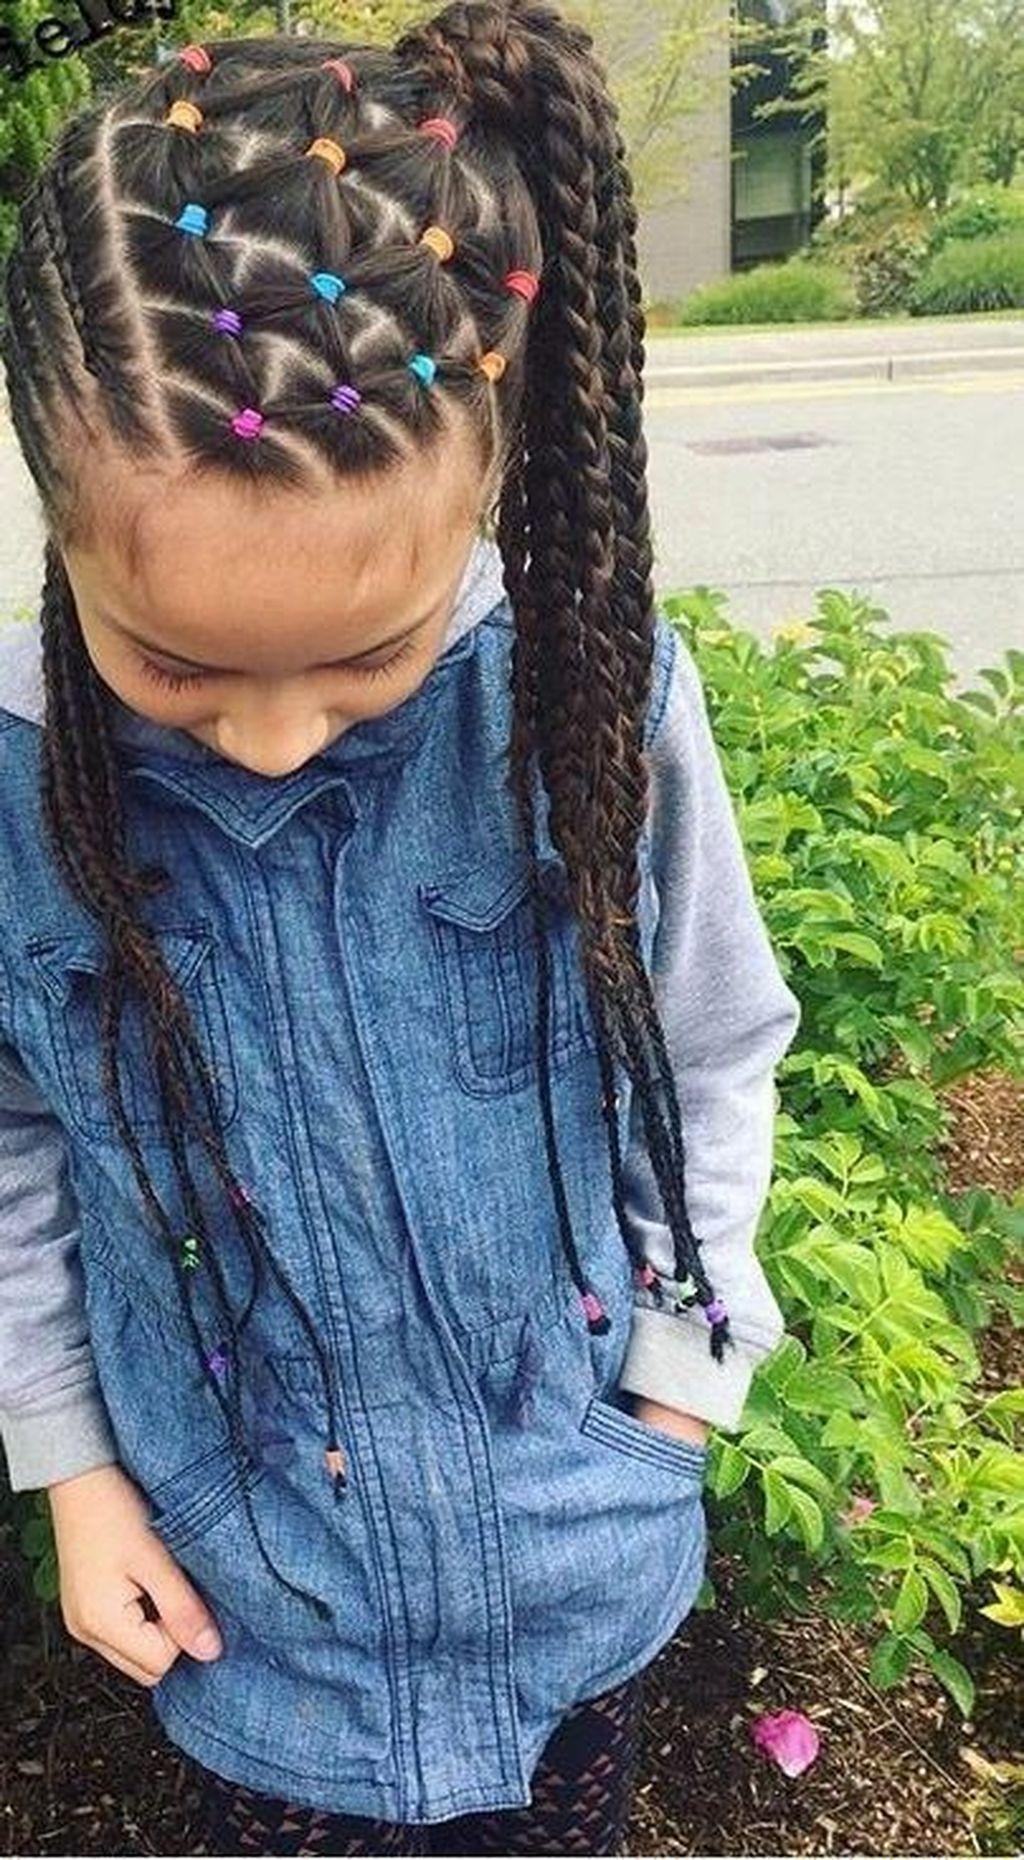 50 Pretty Kids Braided Hairstyles Ideas With Beads - 50Fashionholic - Hair Beauty